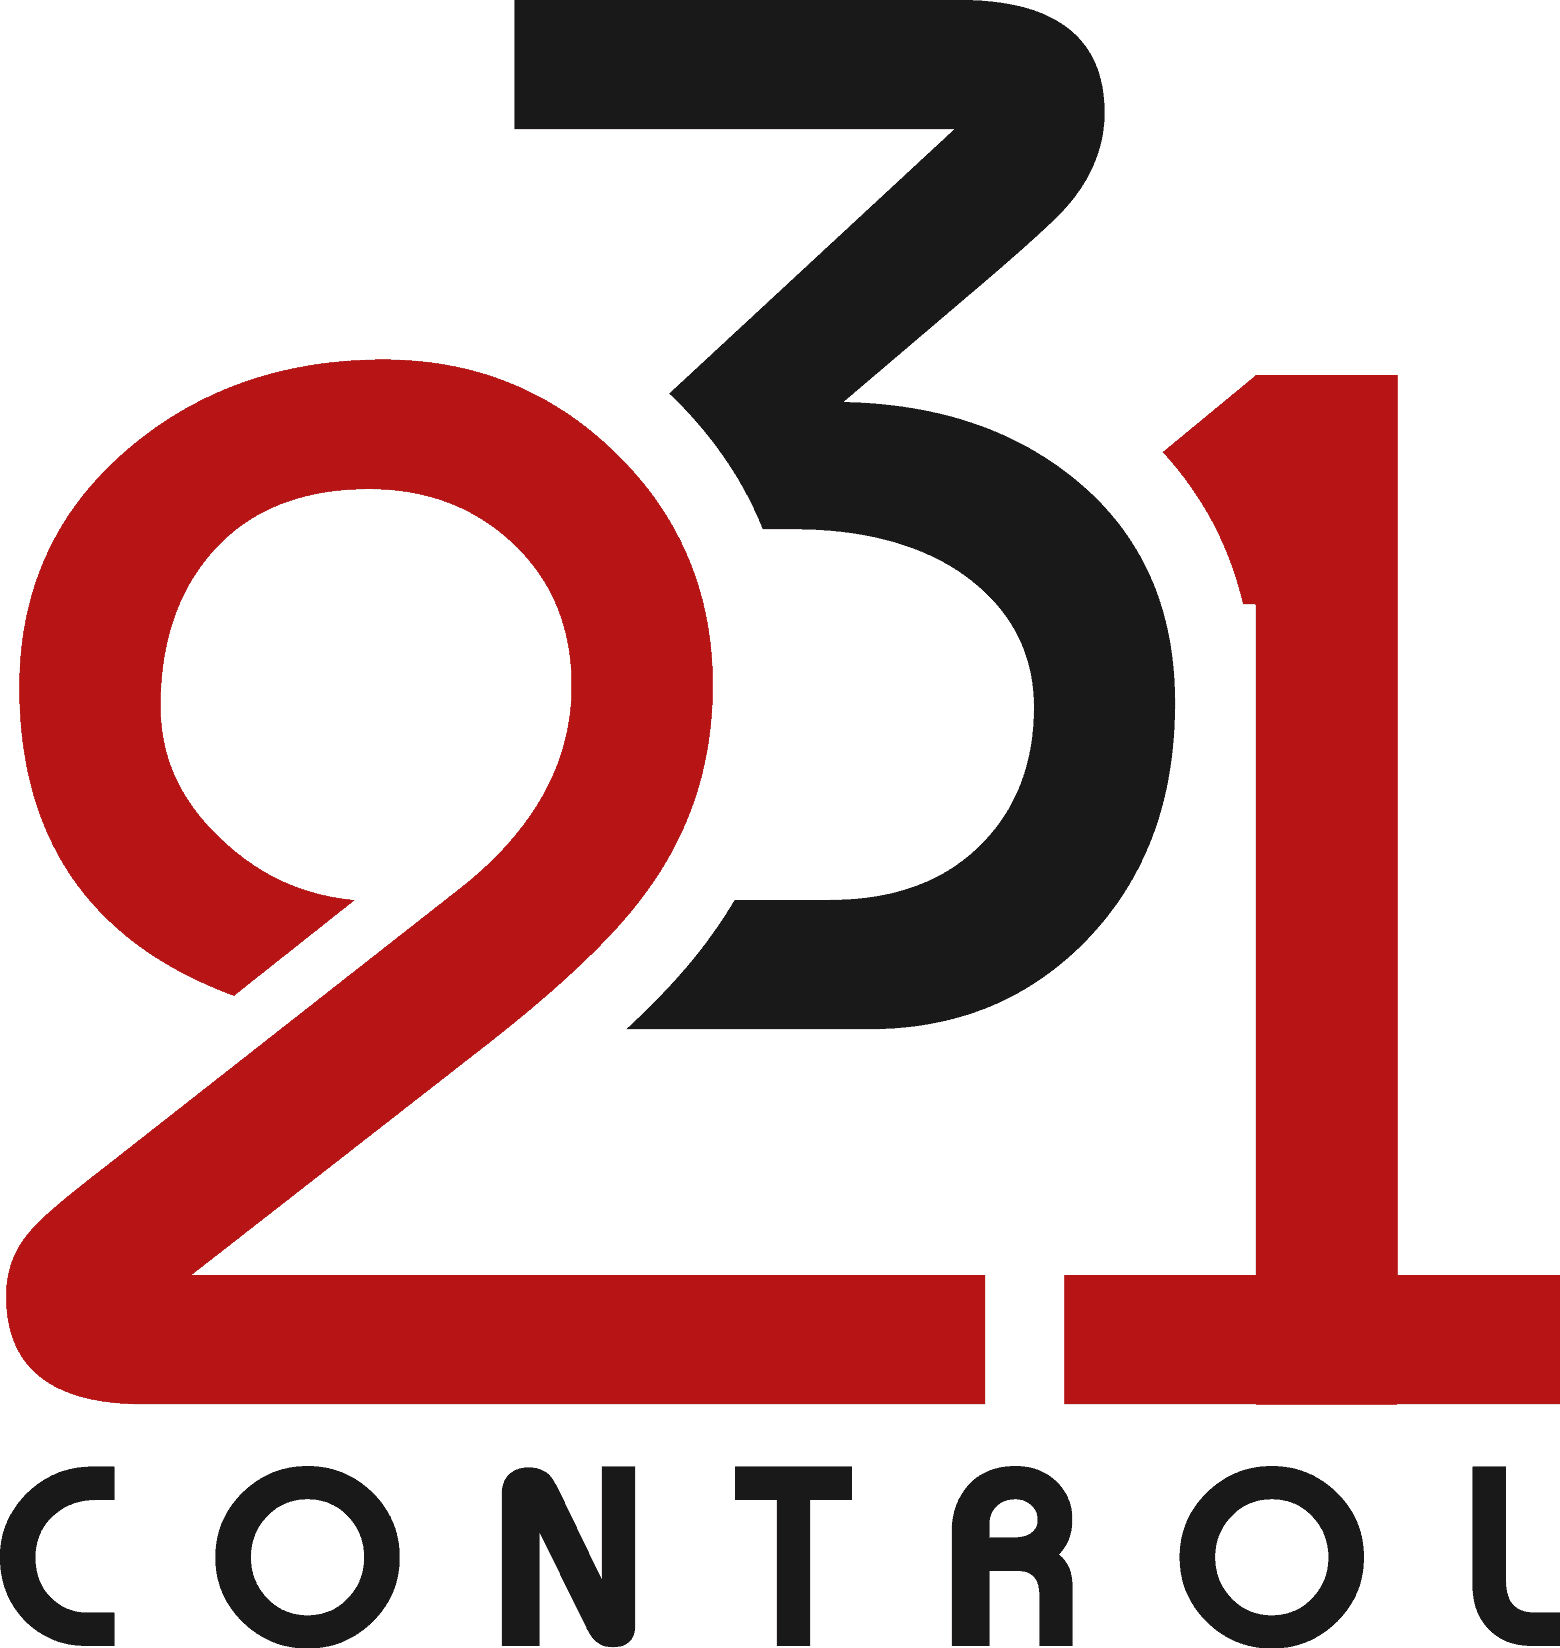 231 Control Logo